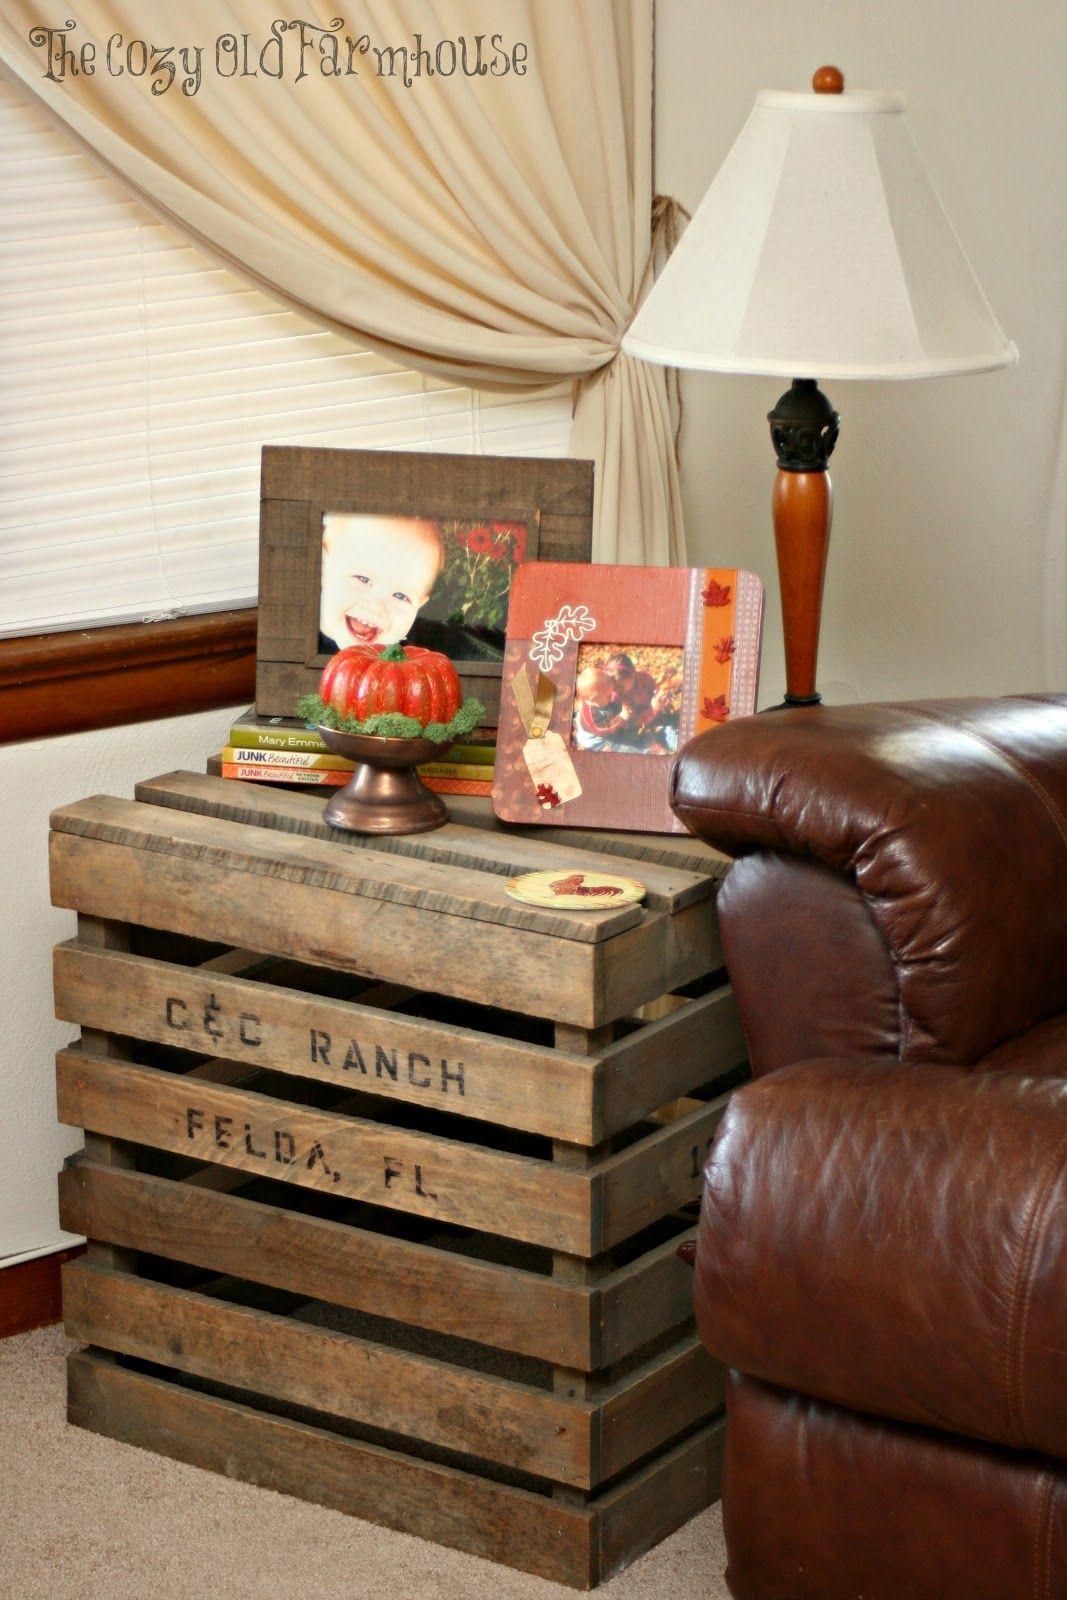 The Cozy Old Farmhouse Fall Decor Part 2